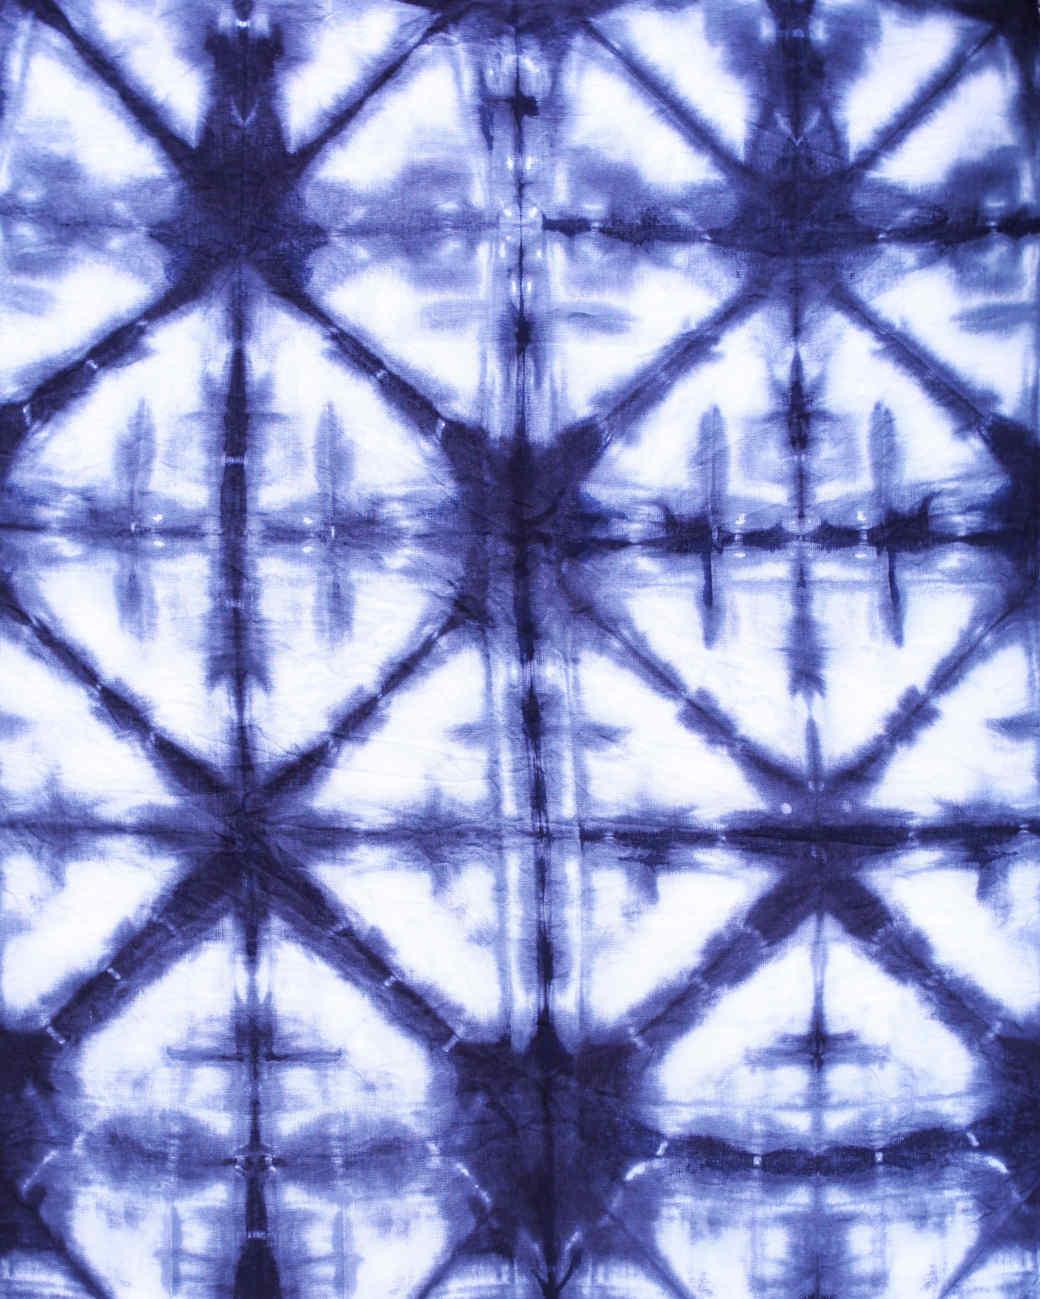 Blue and white Itajime Triangle pattern